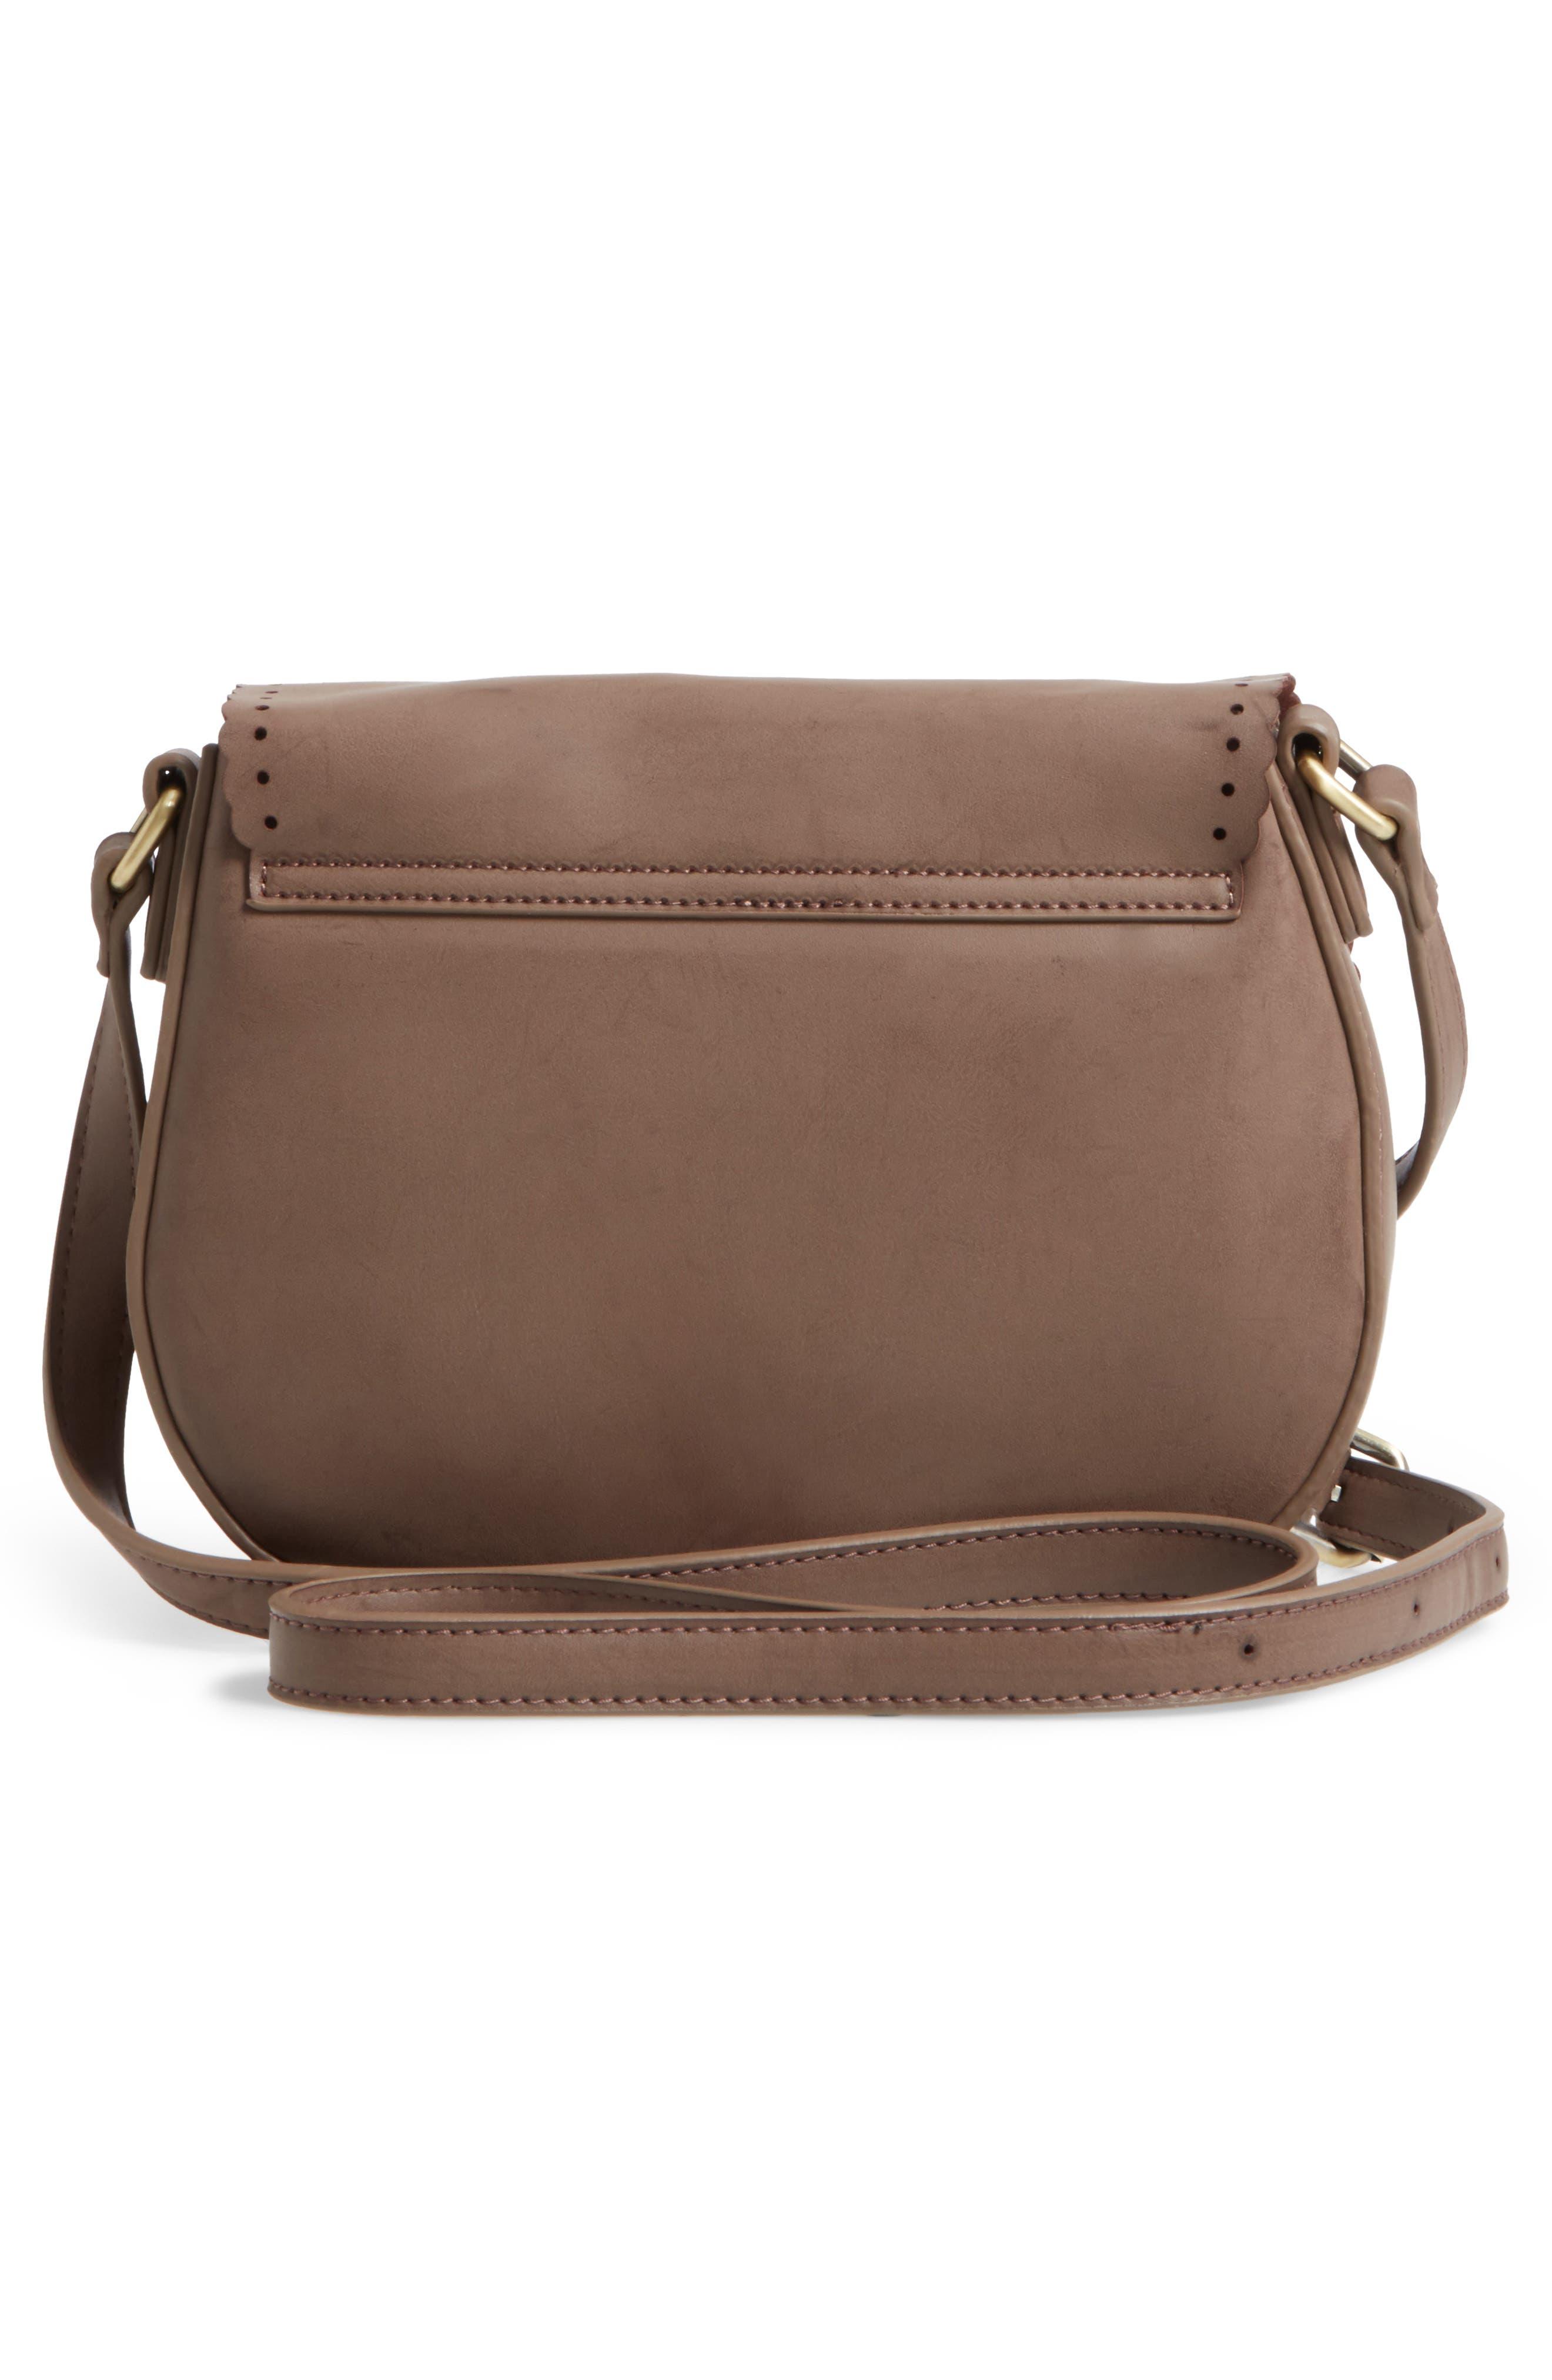 Dakota Faux Leather Saddle Bag,                             Alternate thumbnail 3, color,                             022